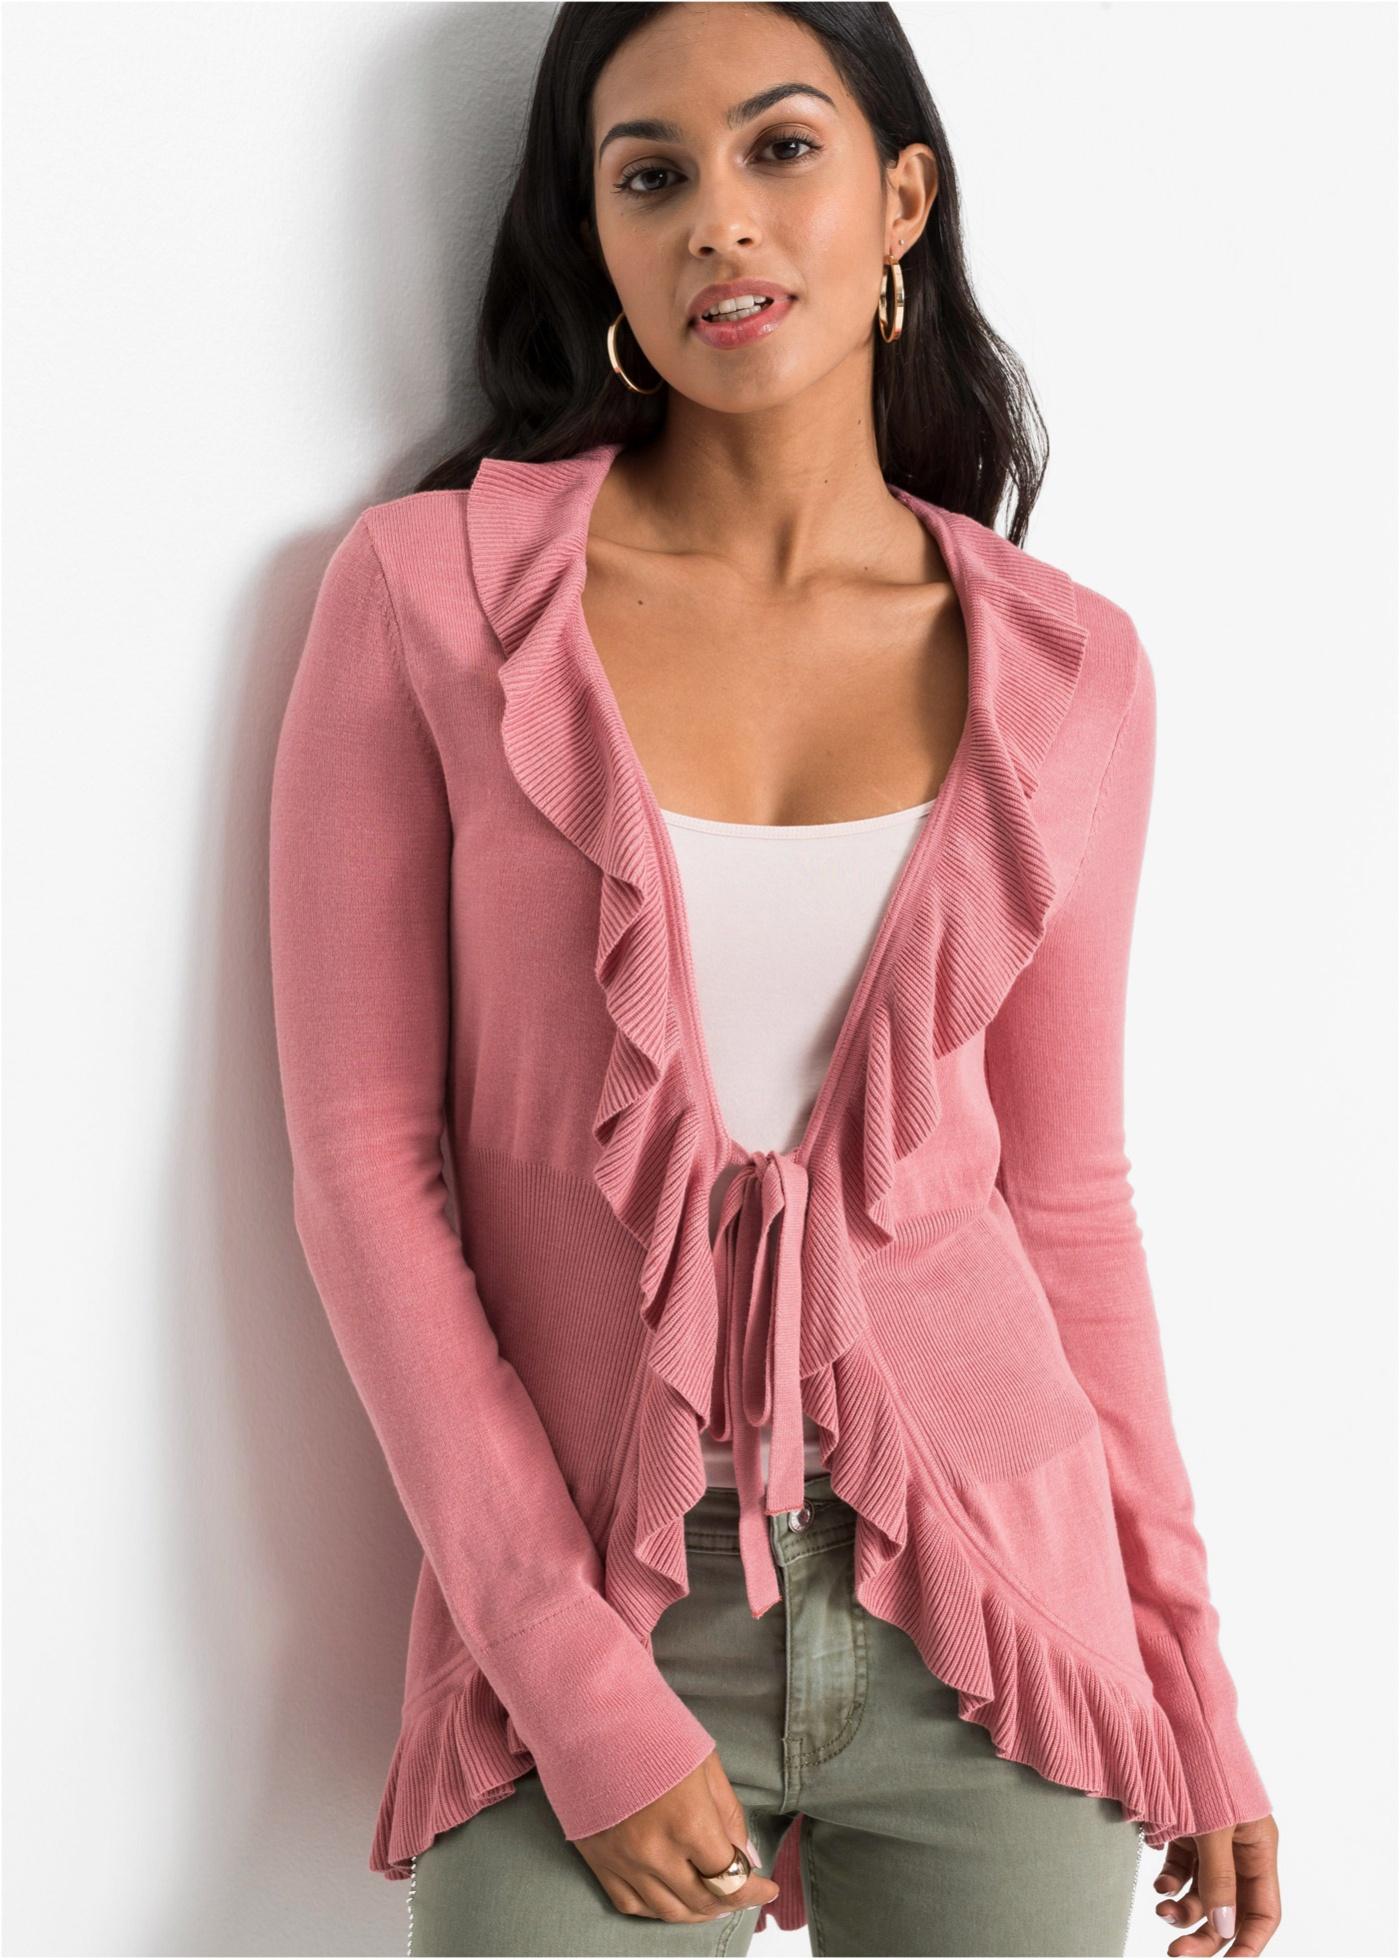 Pletený kabátek s volány - Růžová